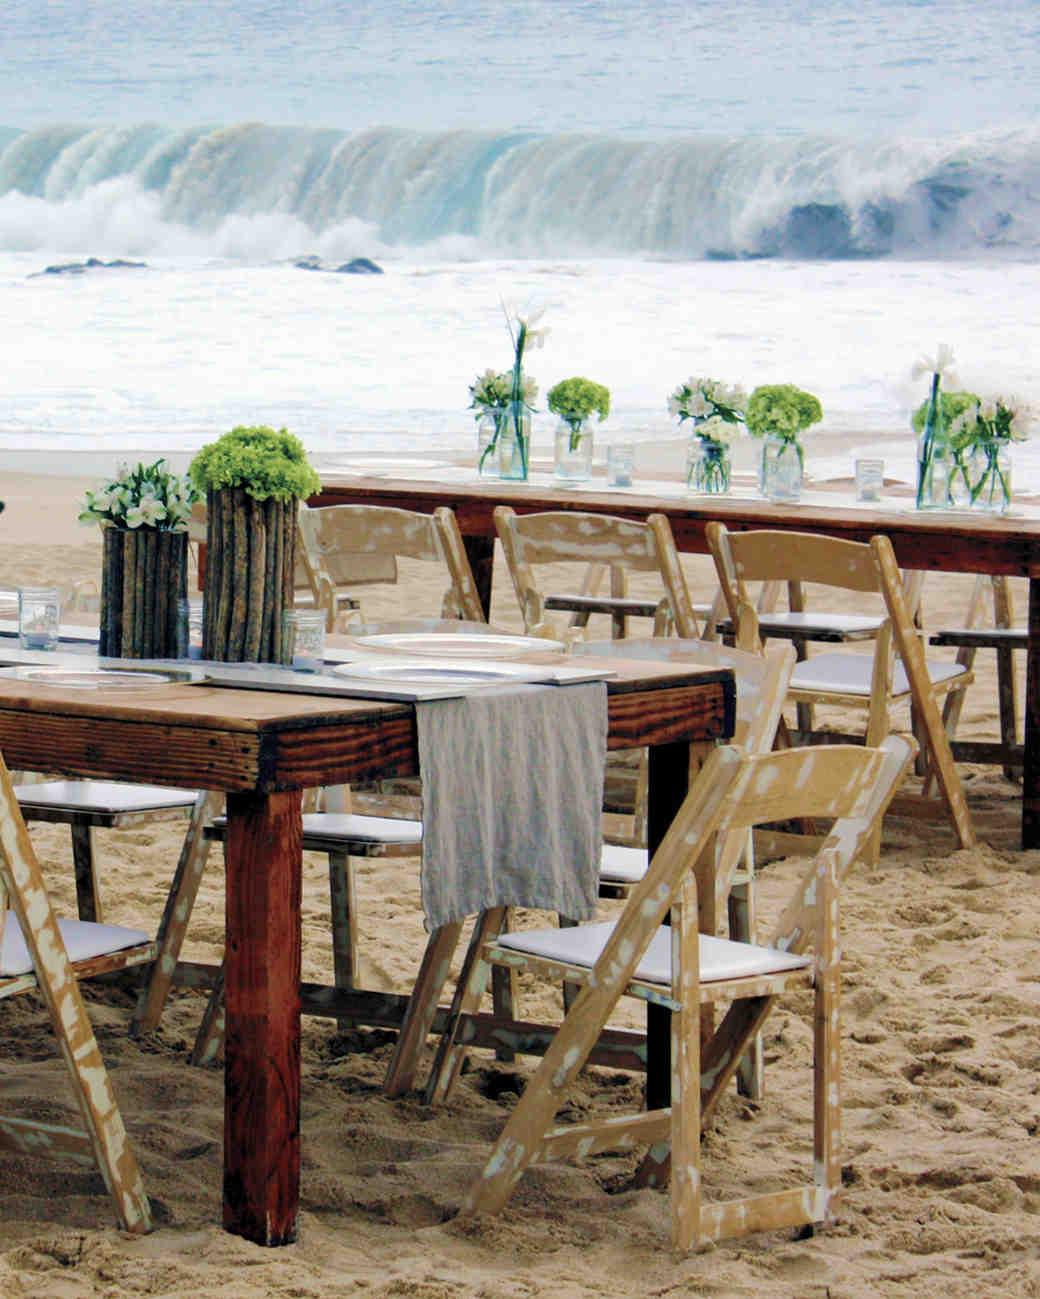 tables-beach-waves-mwds108363.jpg